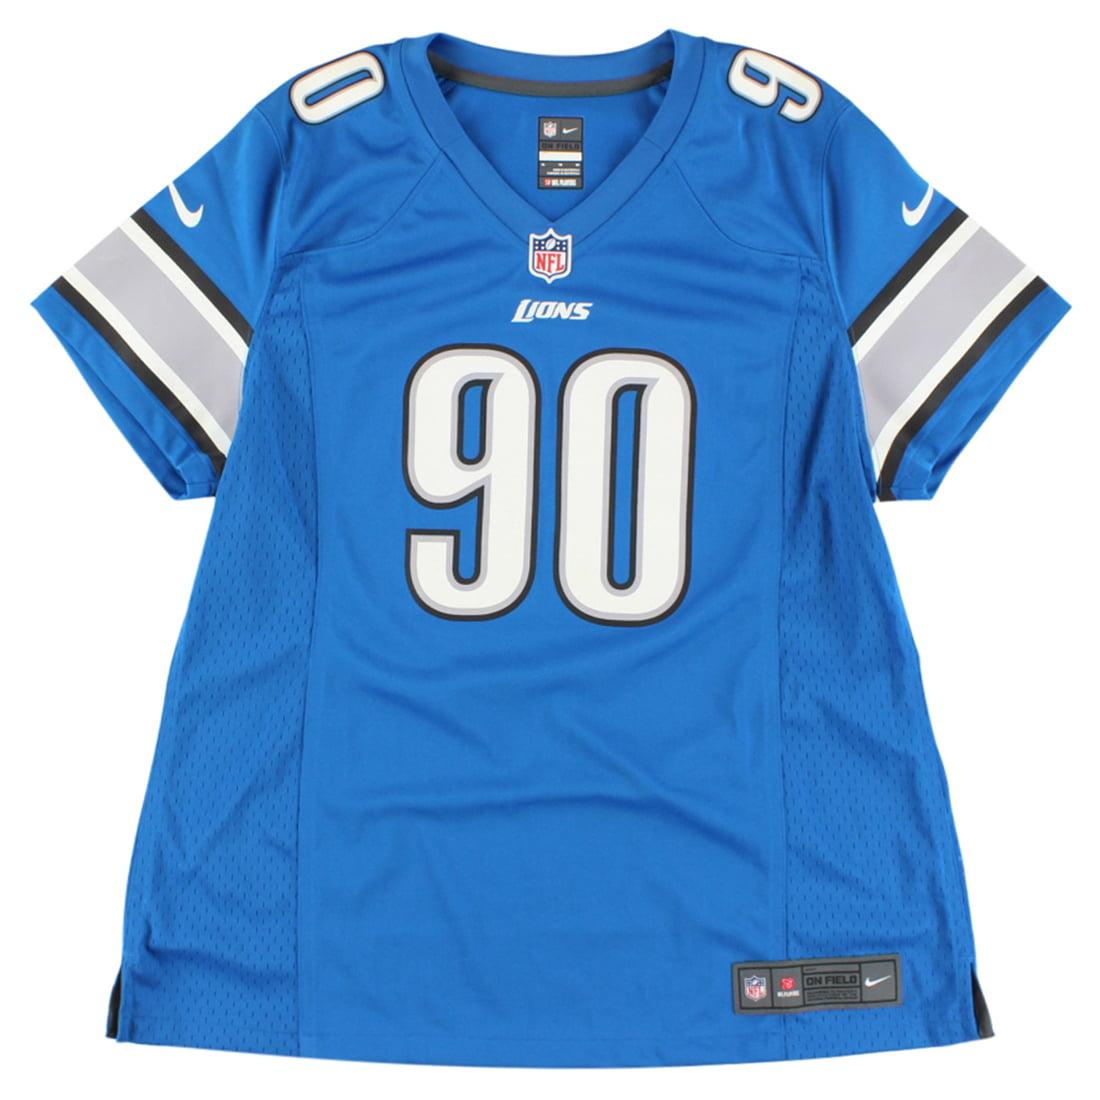 ... best price nike womens detroit lions ndamukong suh replica jersey blue  cc9bb ef9e7 2434cea9d